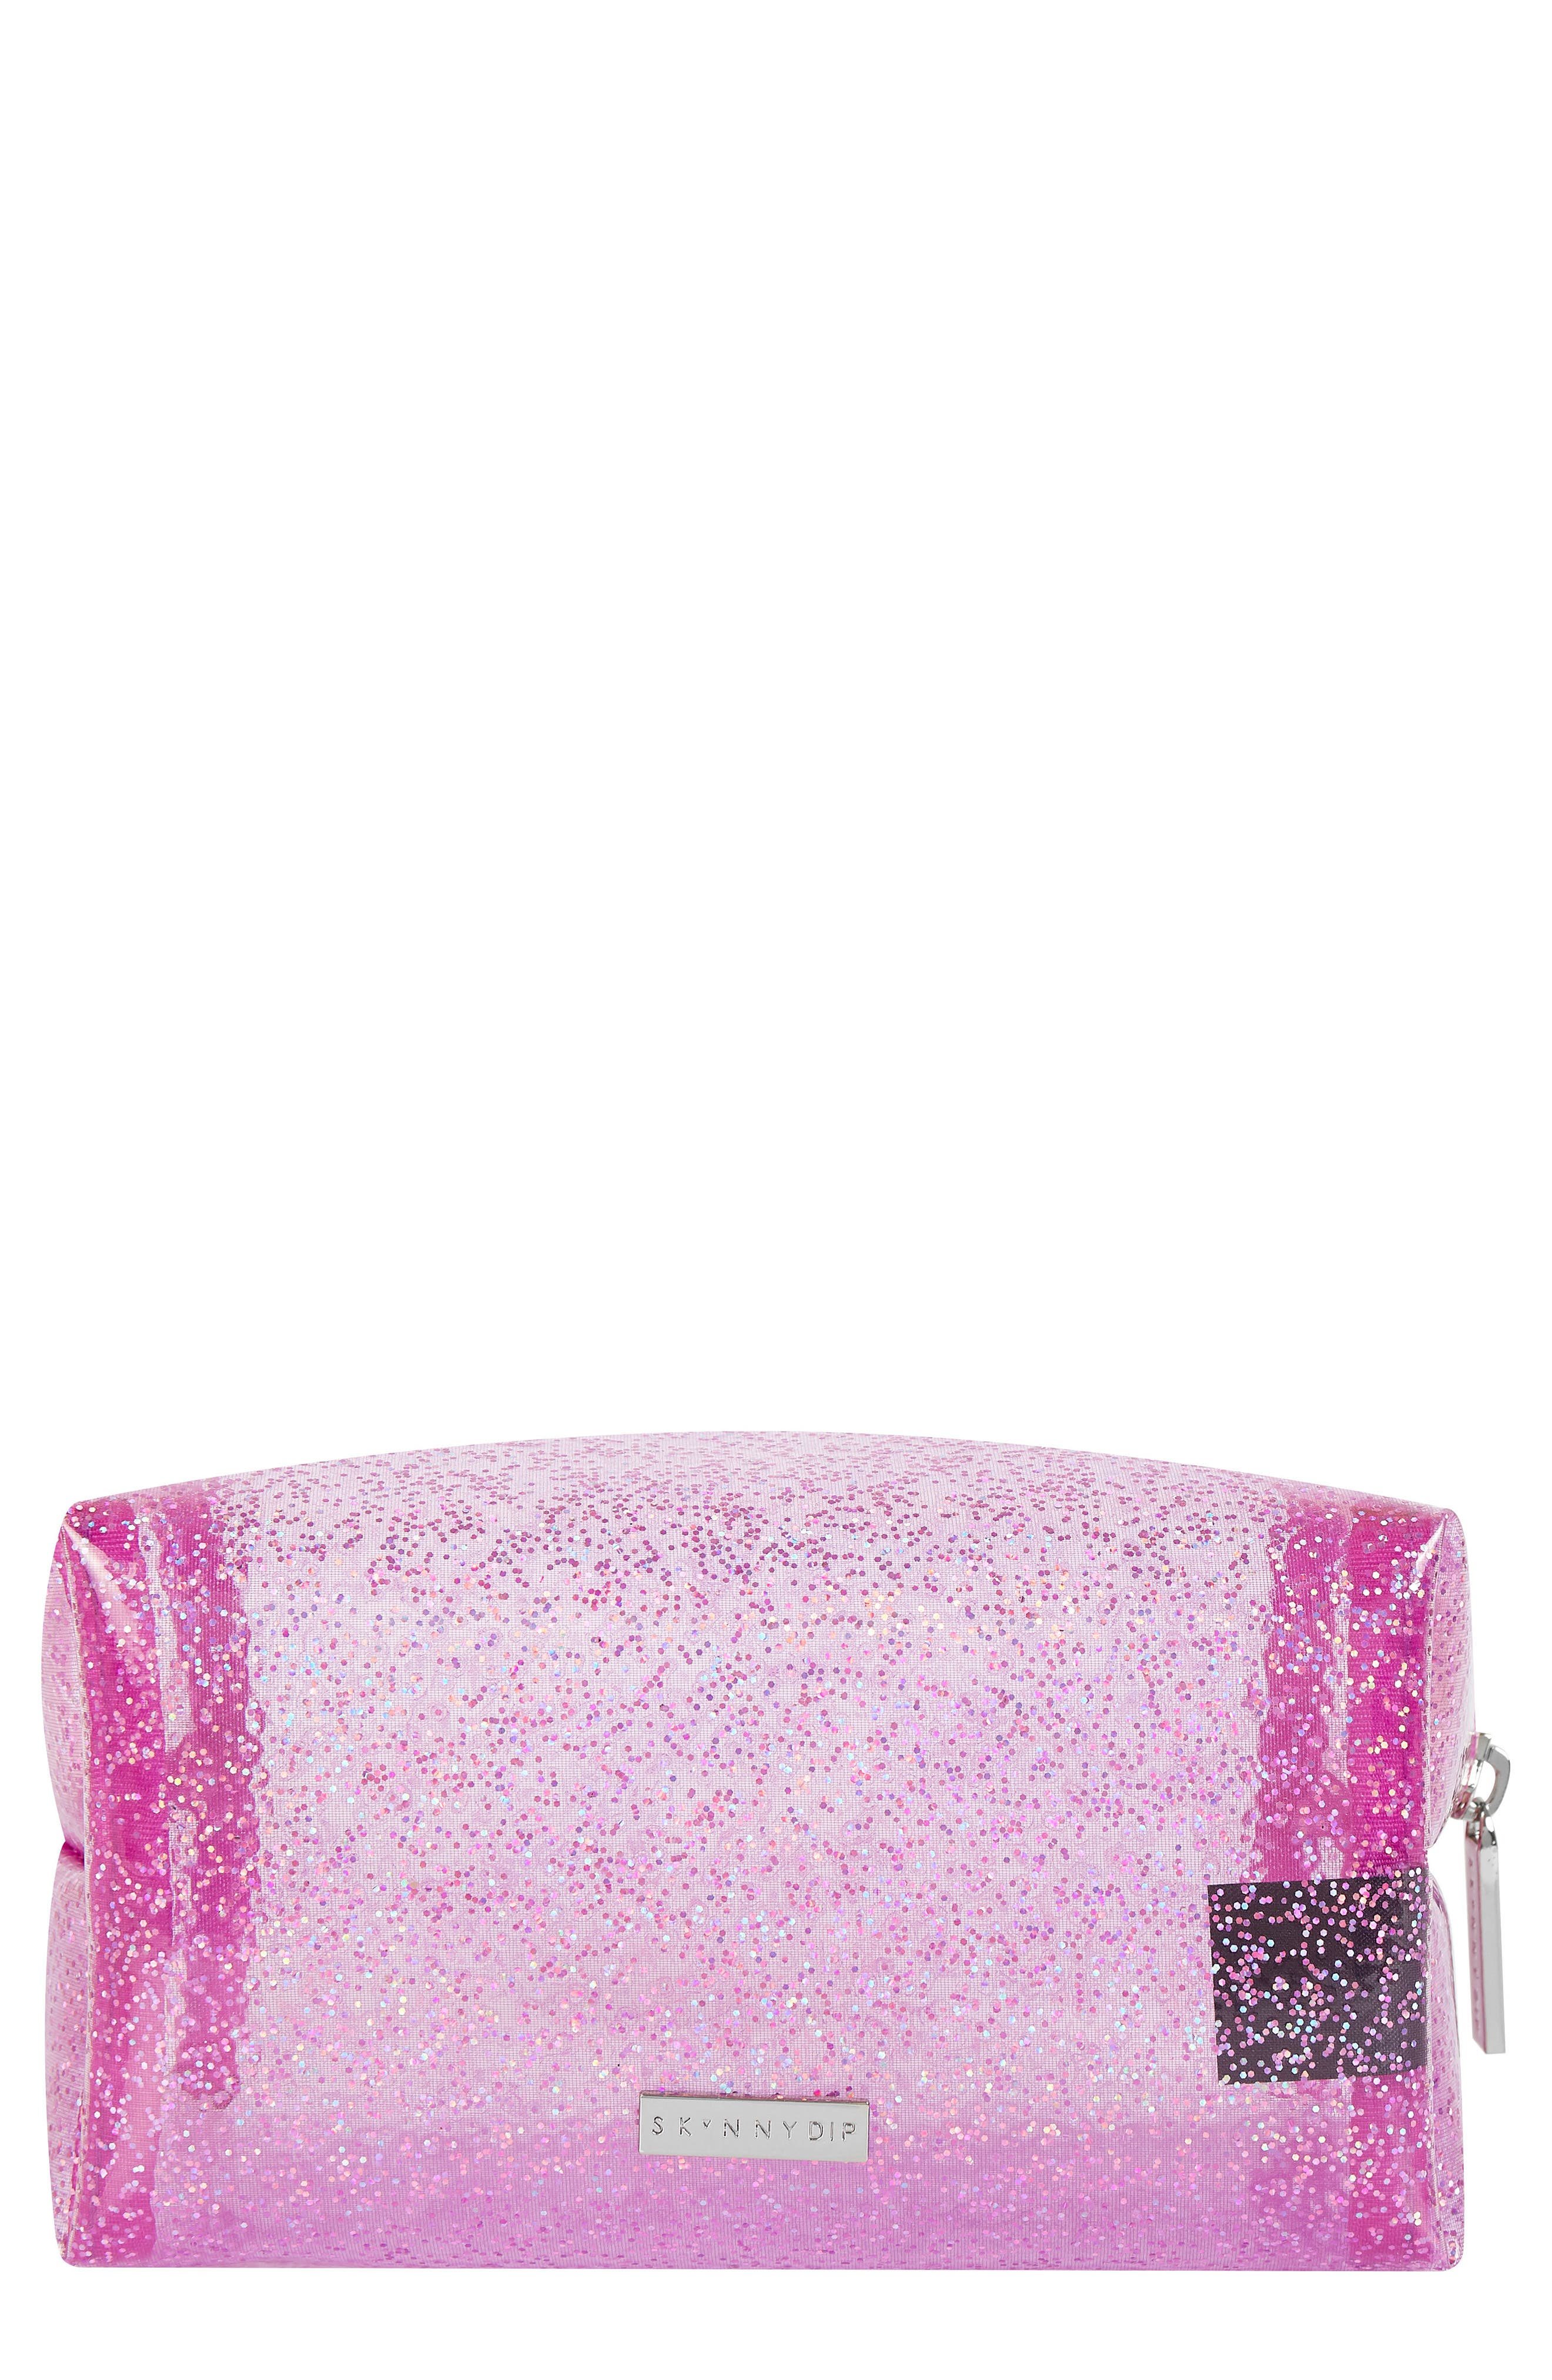 Skinny Dip Glitter Bomb Makeup Bag,                             Main thumbnail 1, color,                             No Color